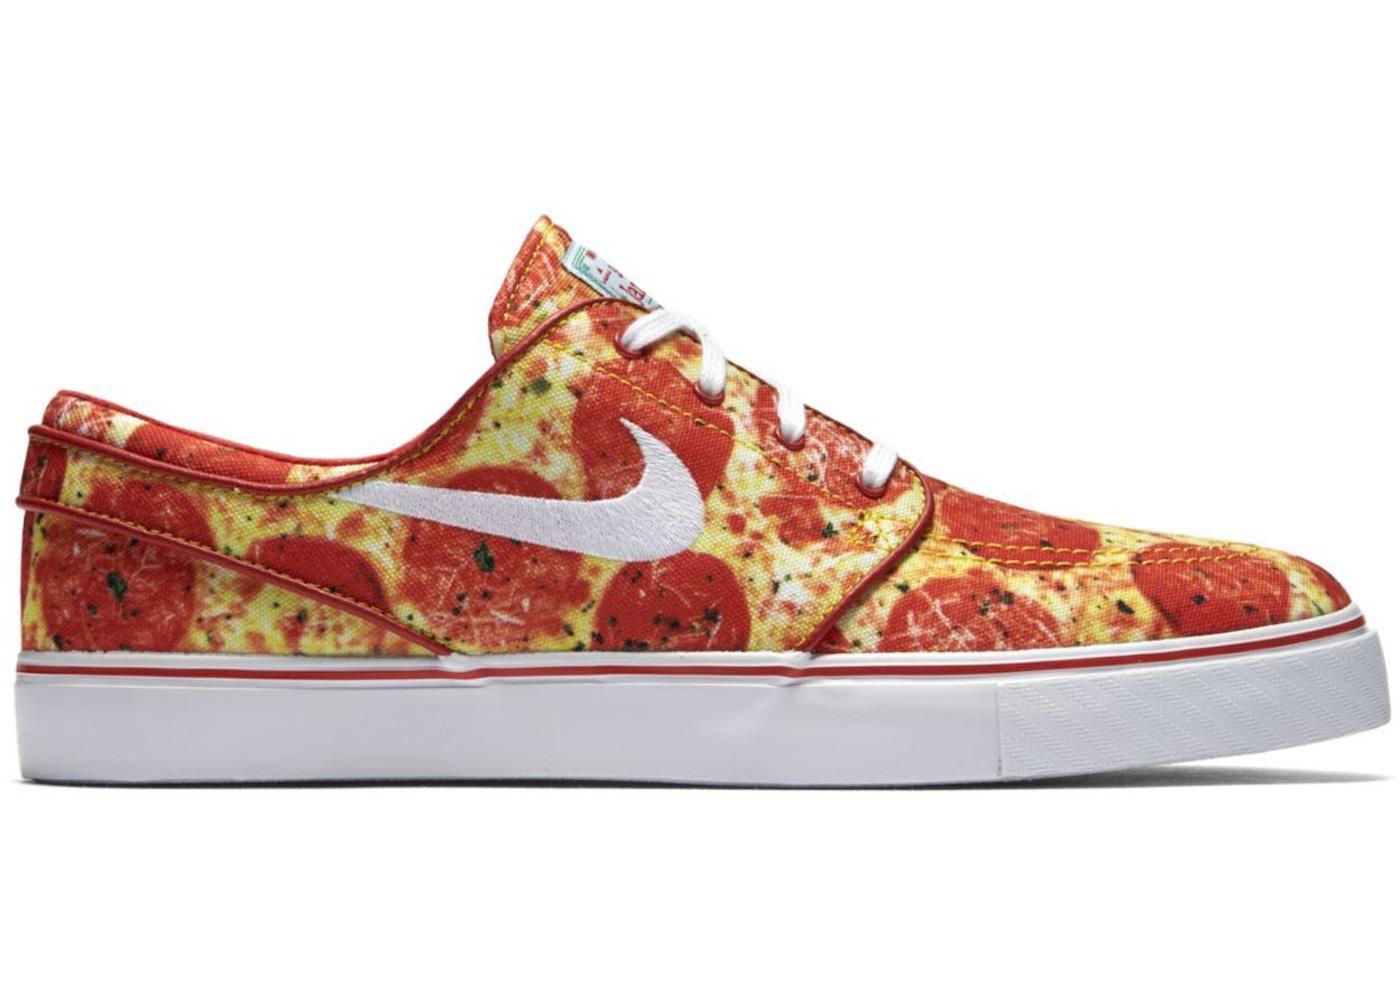 24f9cc542e Nike SB Stefan Janoski Skate Mental Pepperoni Pizza - 845711-619